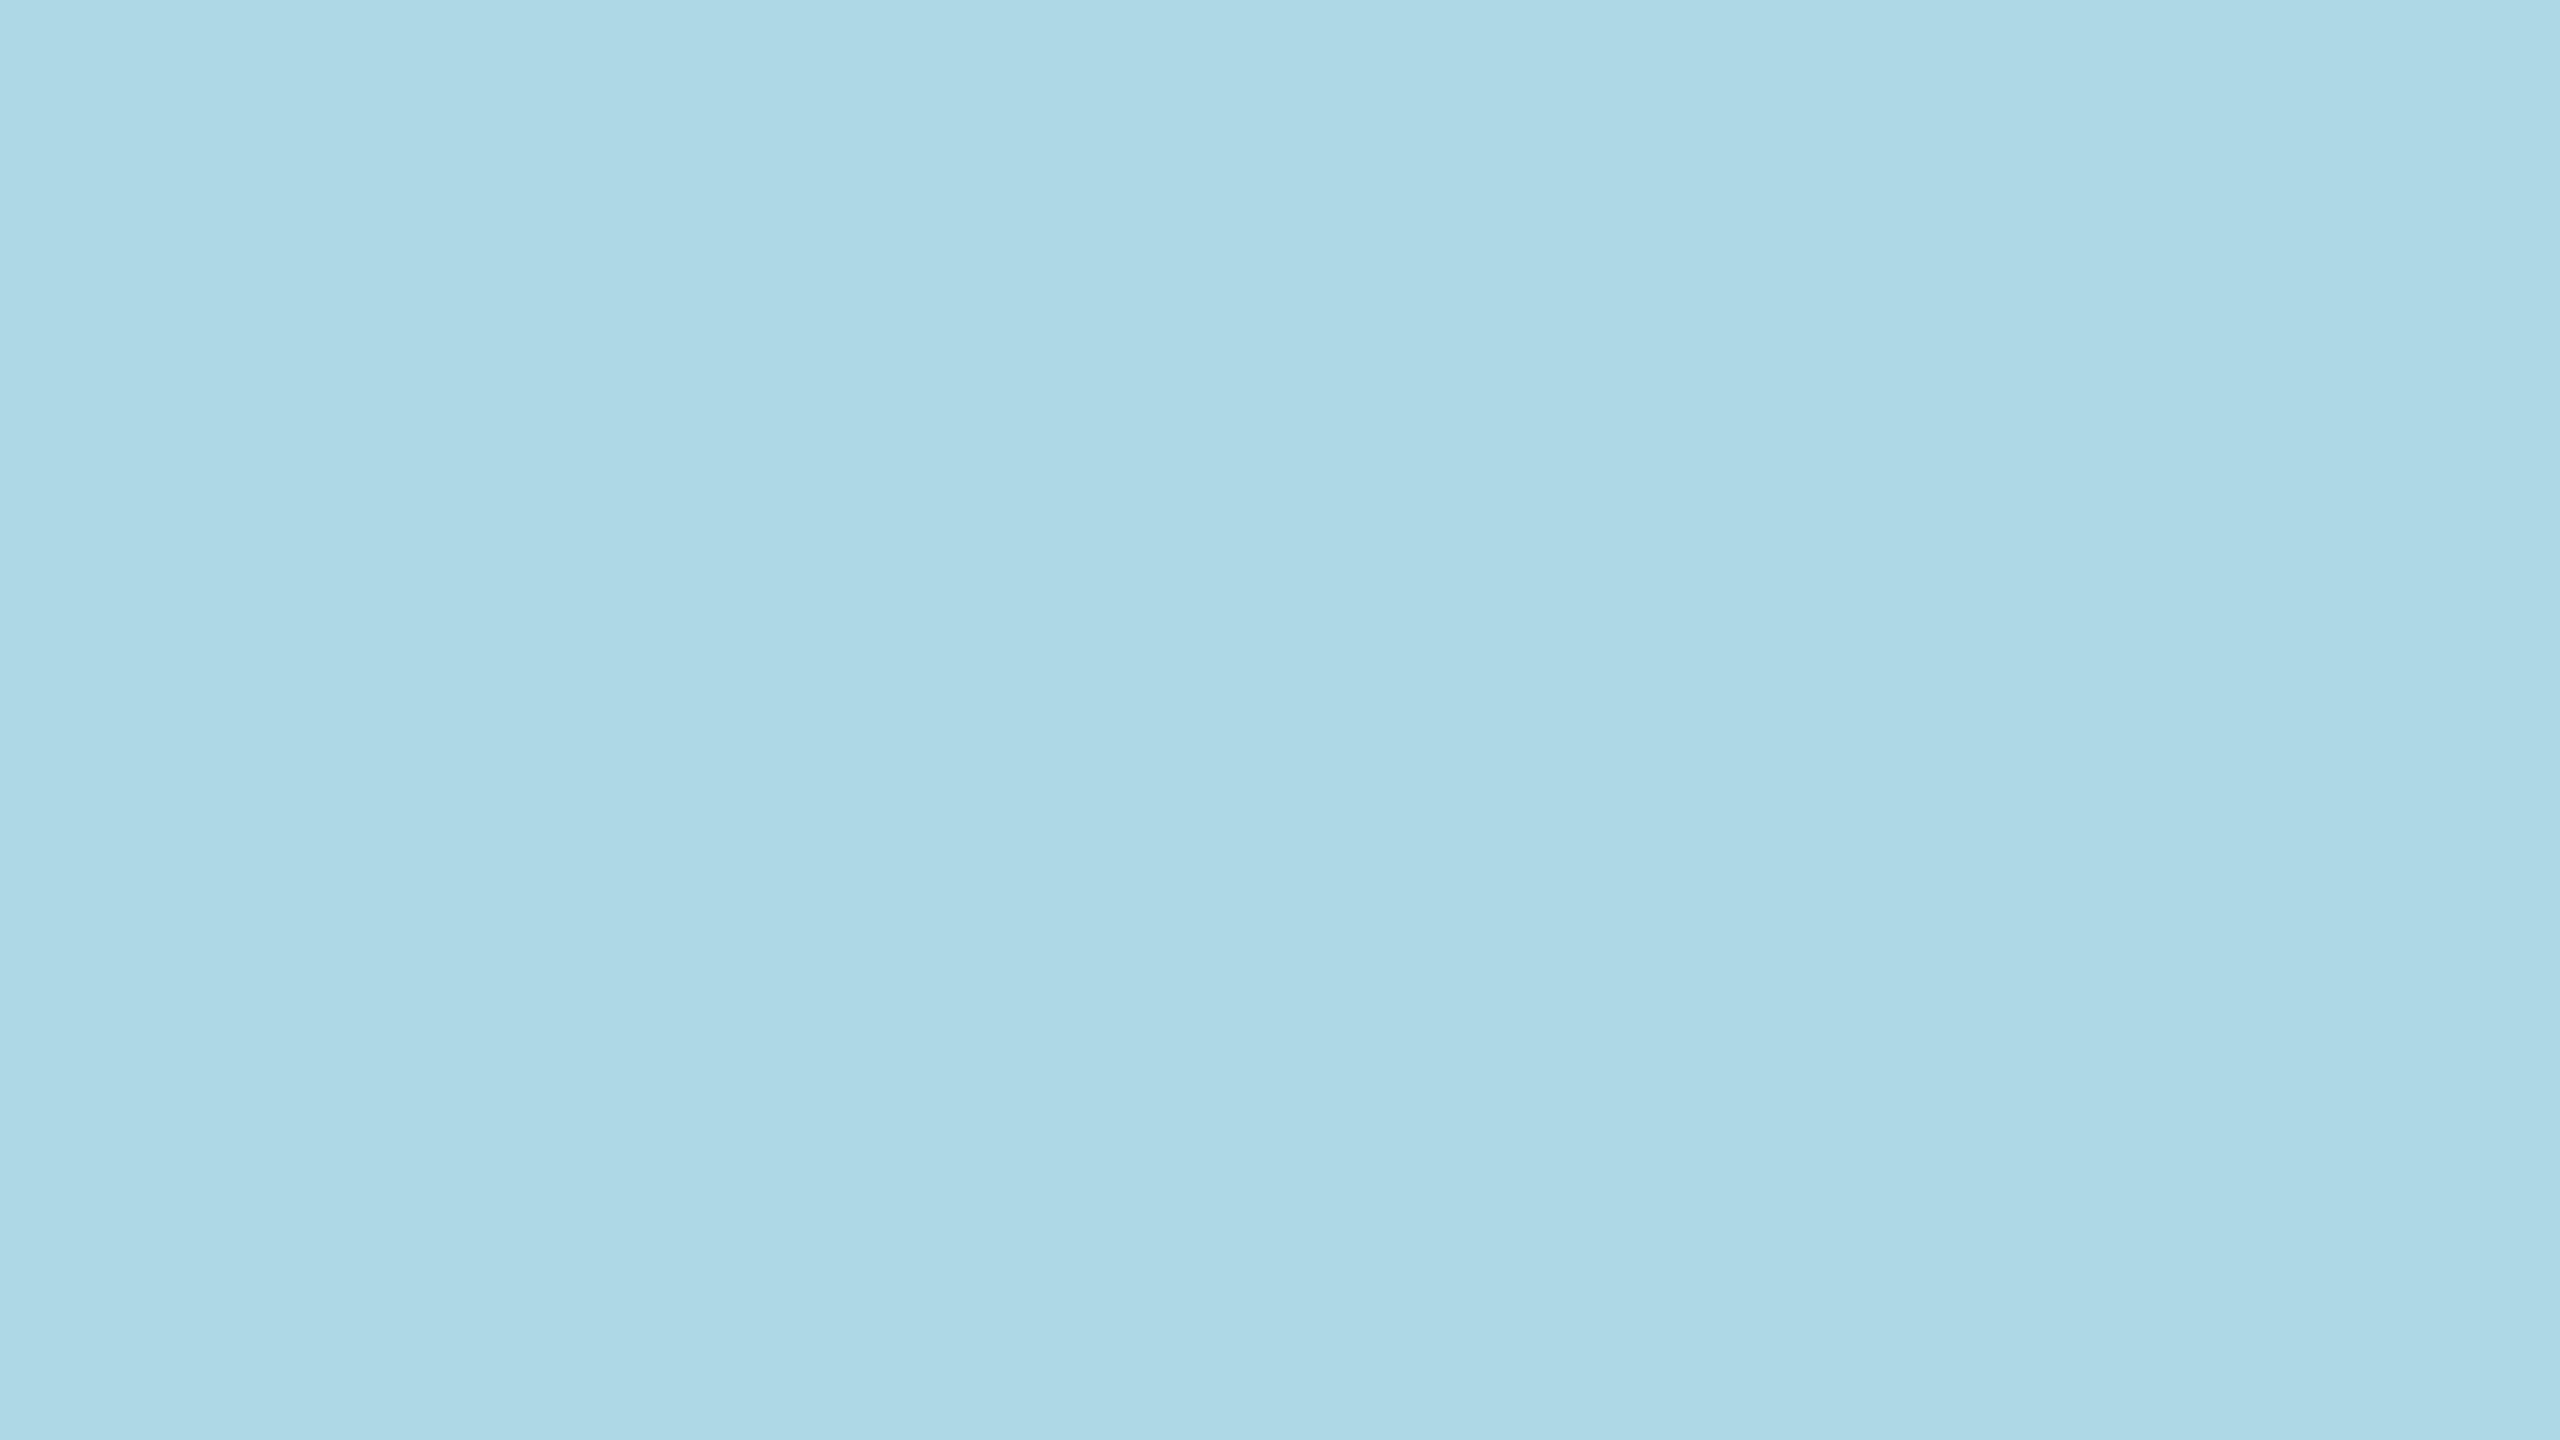 hinh nen powerpoint mau xanh 6